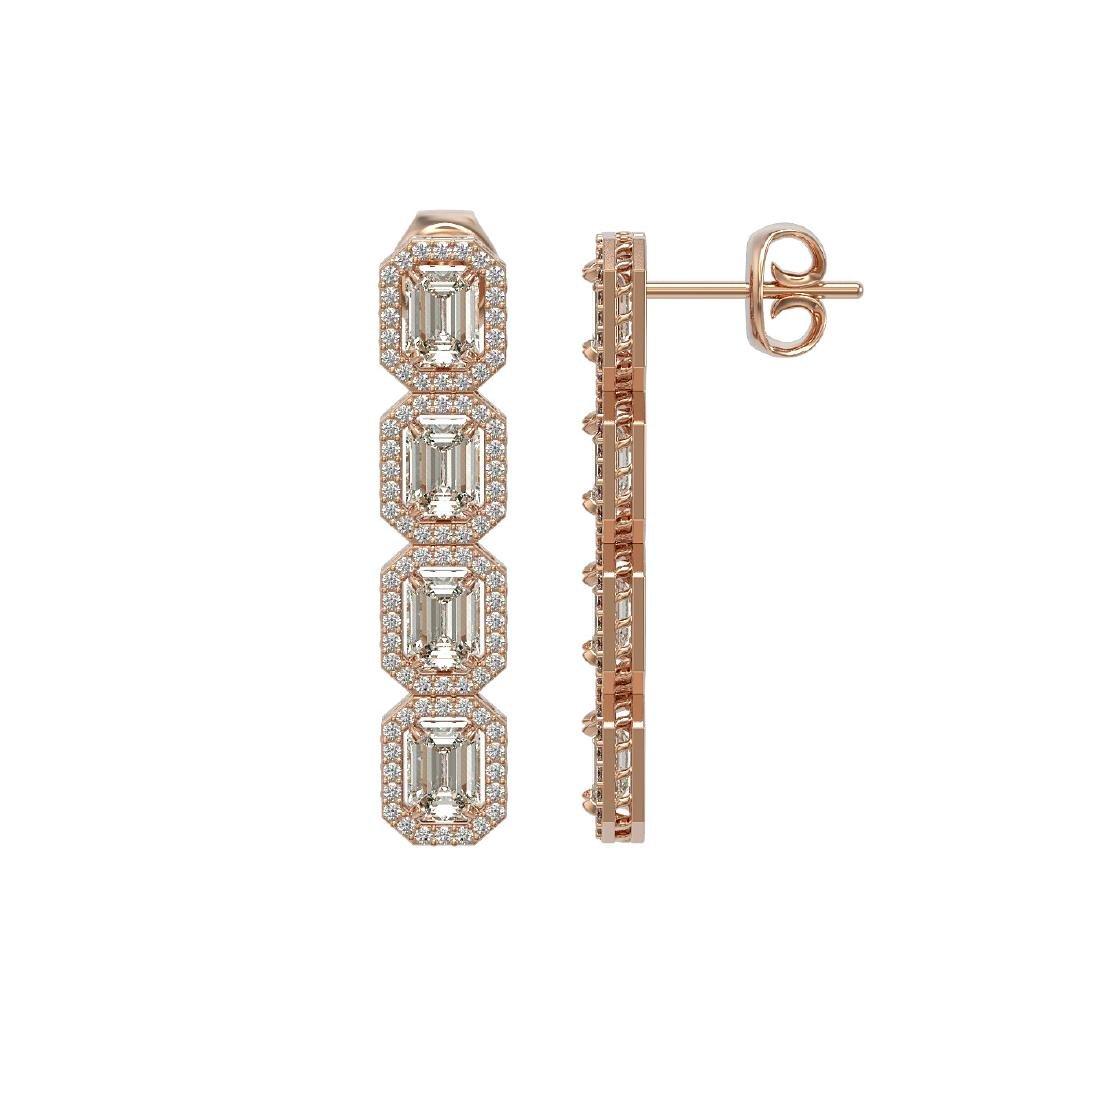 5.33 CTW Emerald Cut Diamond Designer Earrings 18K Rose - 2